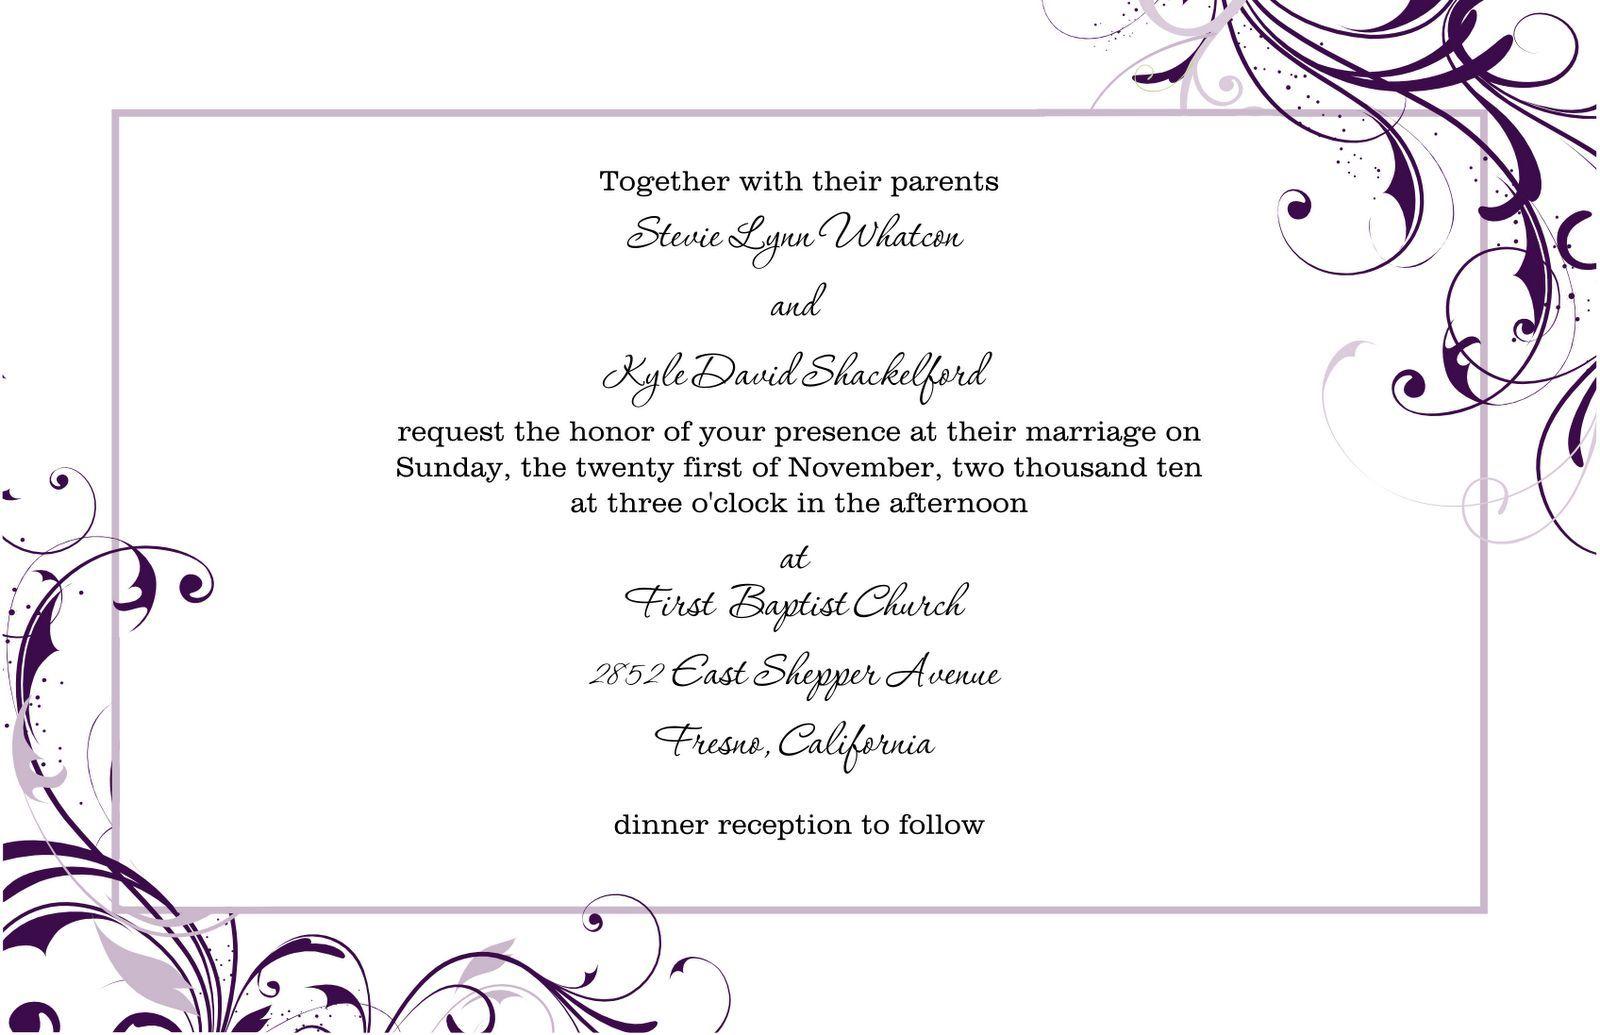 Chalkboard christmas invitation card template. Free Microsoft Word Wedding Invitation Templates Free Wedding Invitation Templates Blank Wedding Invitation Templates Wedding Invitation Layout